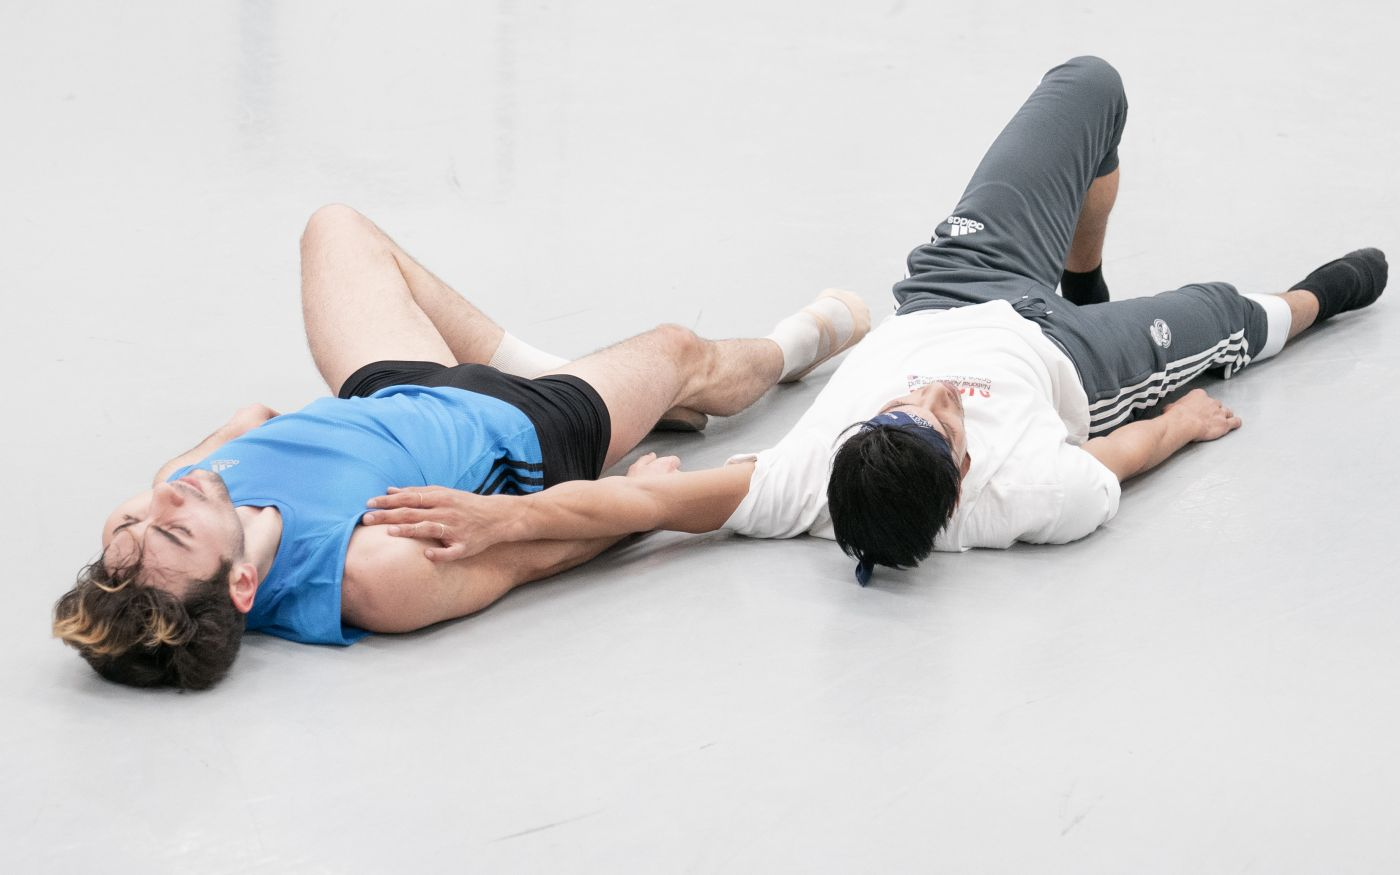 20-21 Back to Ballet Contemporary - Manoeuvre - Nathan - Michele @Jozef Varga-201007-ALT05742.